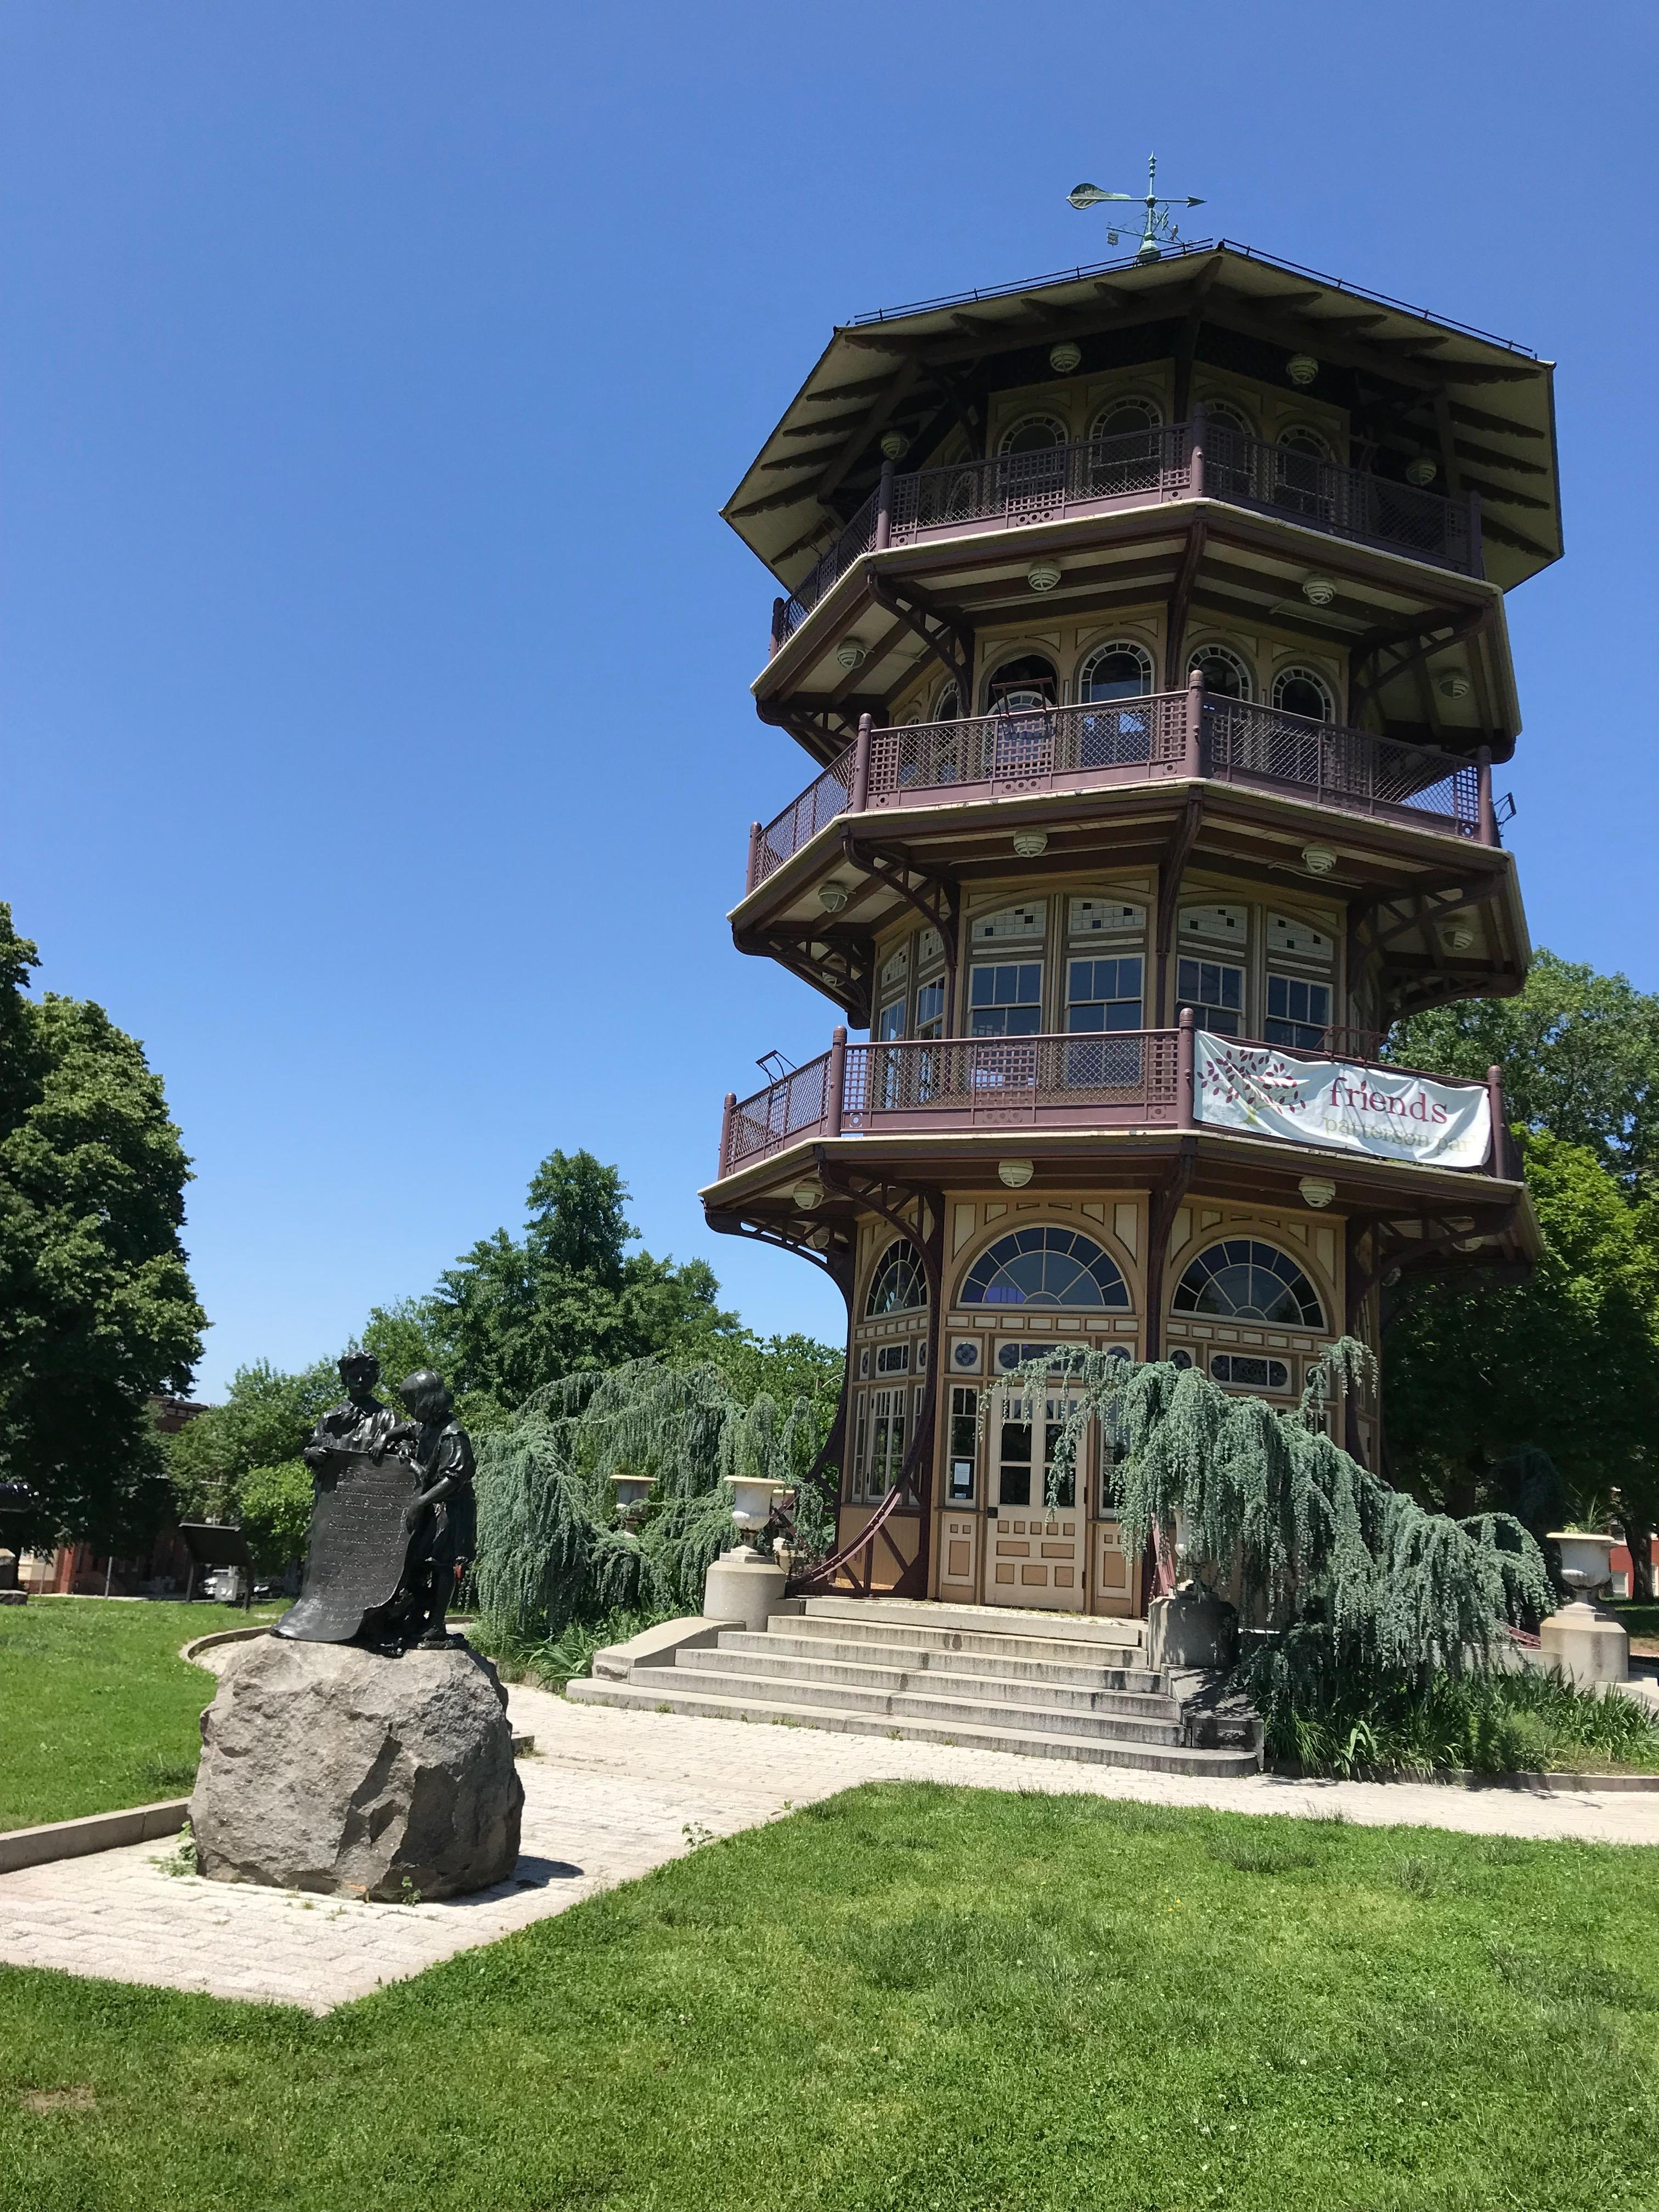 Patterson park pagoda, patterson park near e. pratt street and s. patterson park avenue, baltimore, md 21231 photo